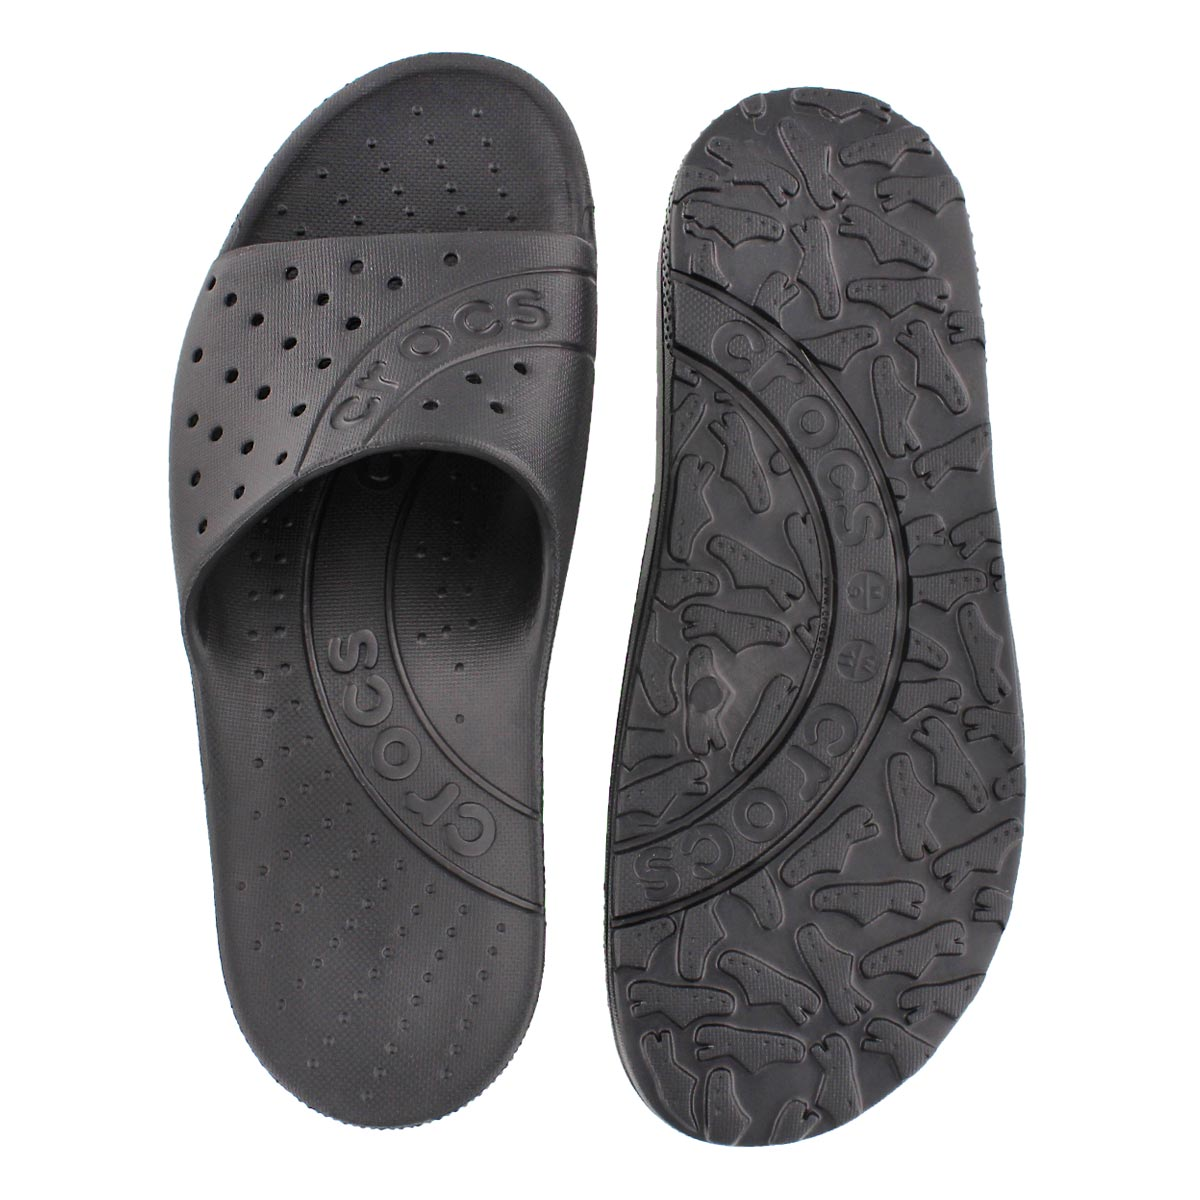 Sandale � enfiler Chawaii, noir, hommes